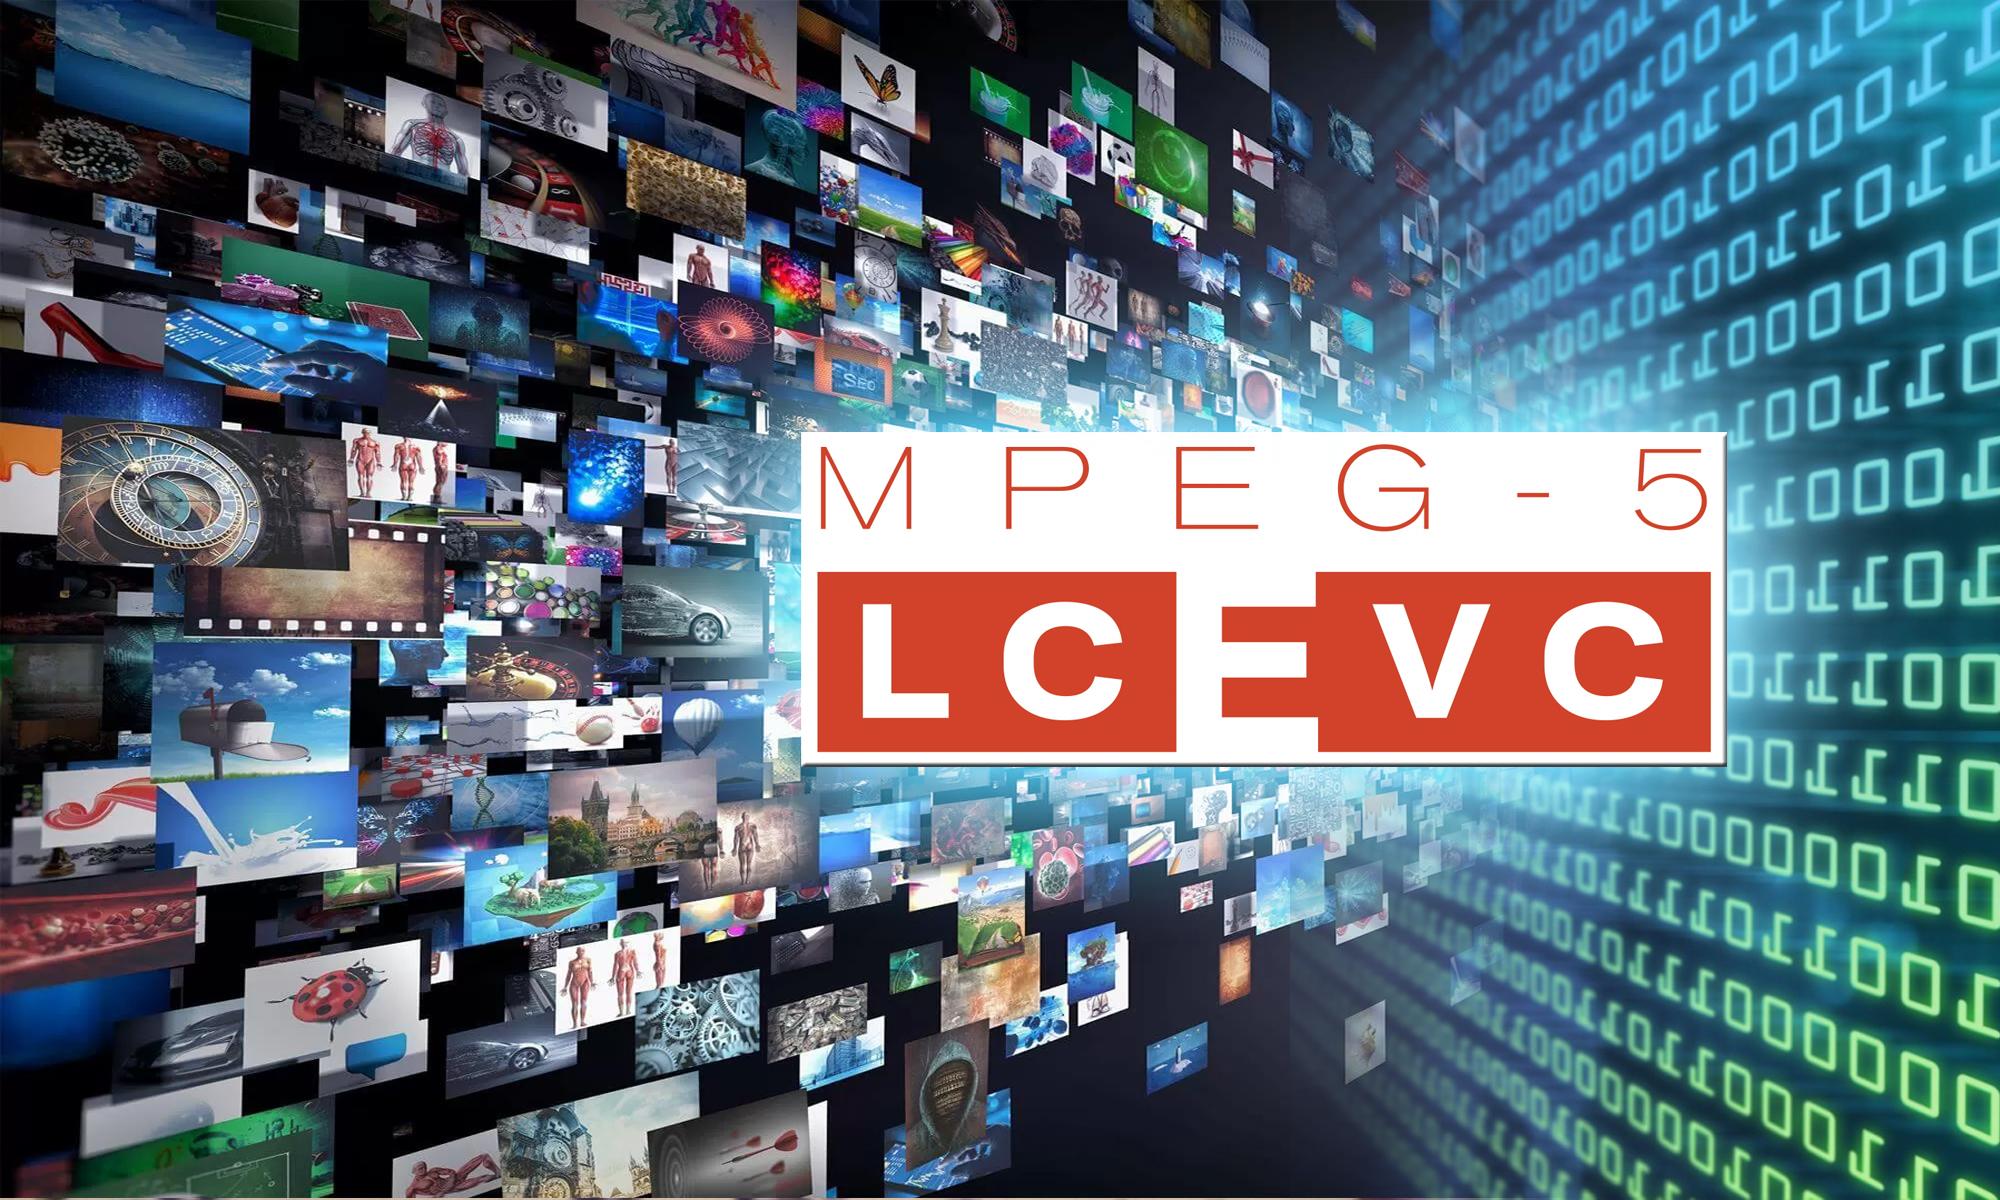 Кодек MPEG-5 Part 2 LCEVC